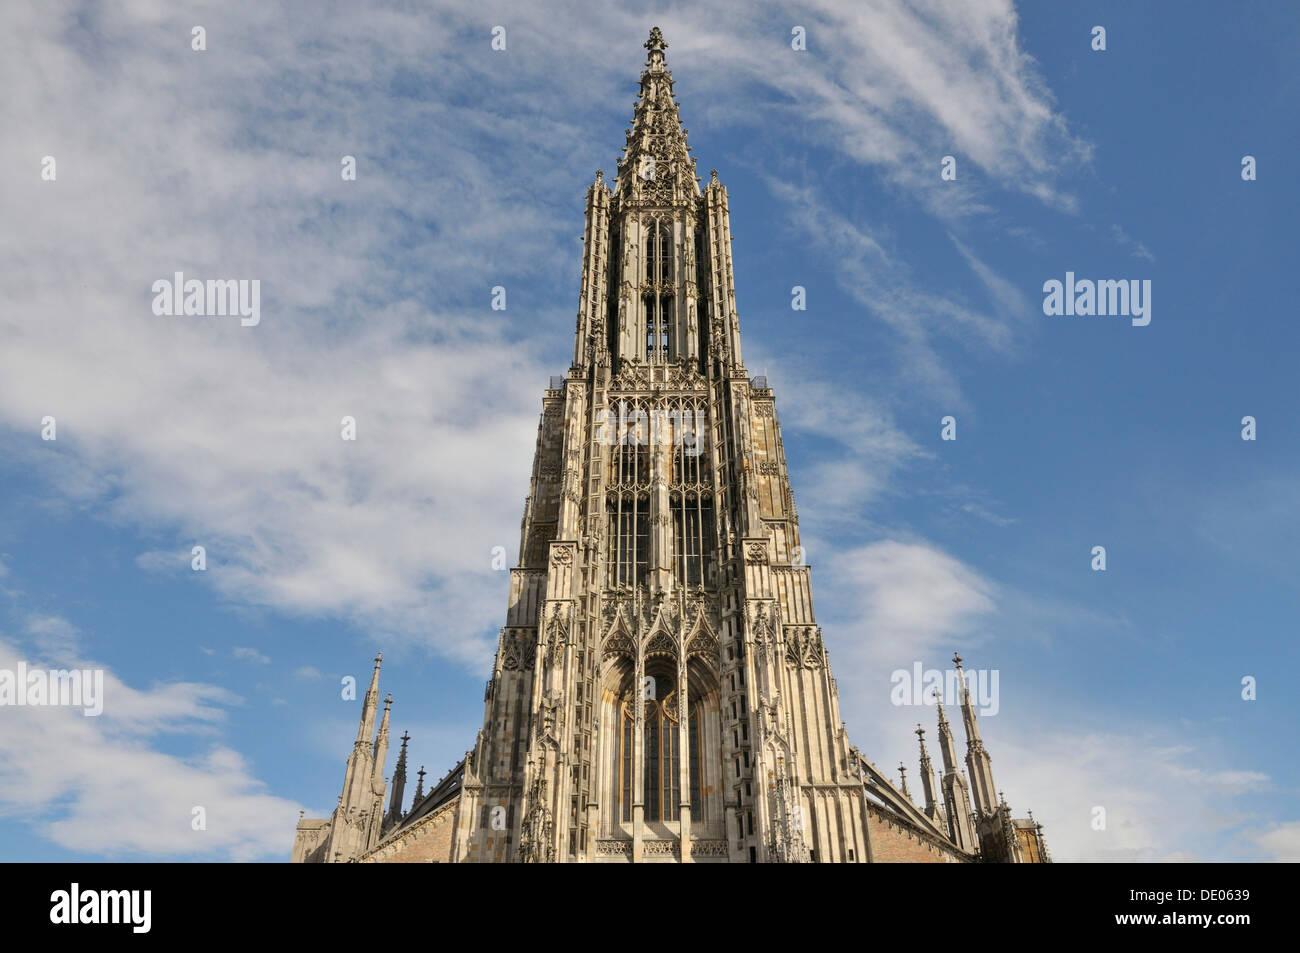 Ulmer Münster Kirche Ulmer Münster 16153 M Der Höchste Kirchturm